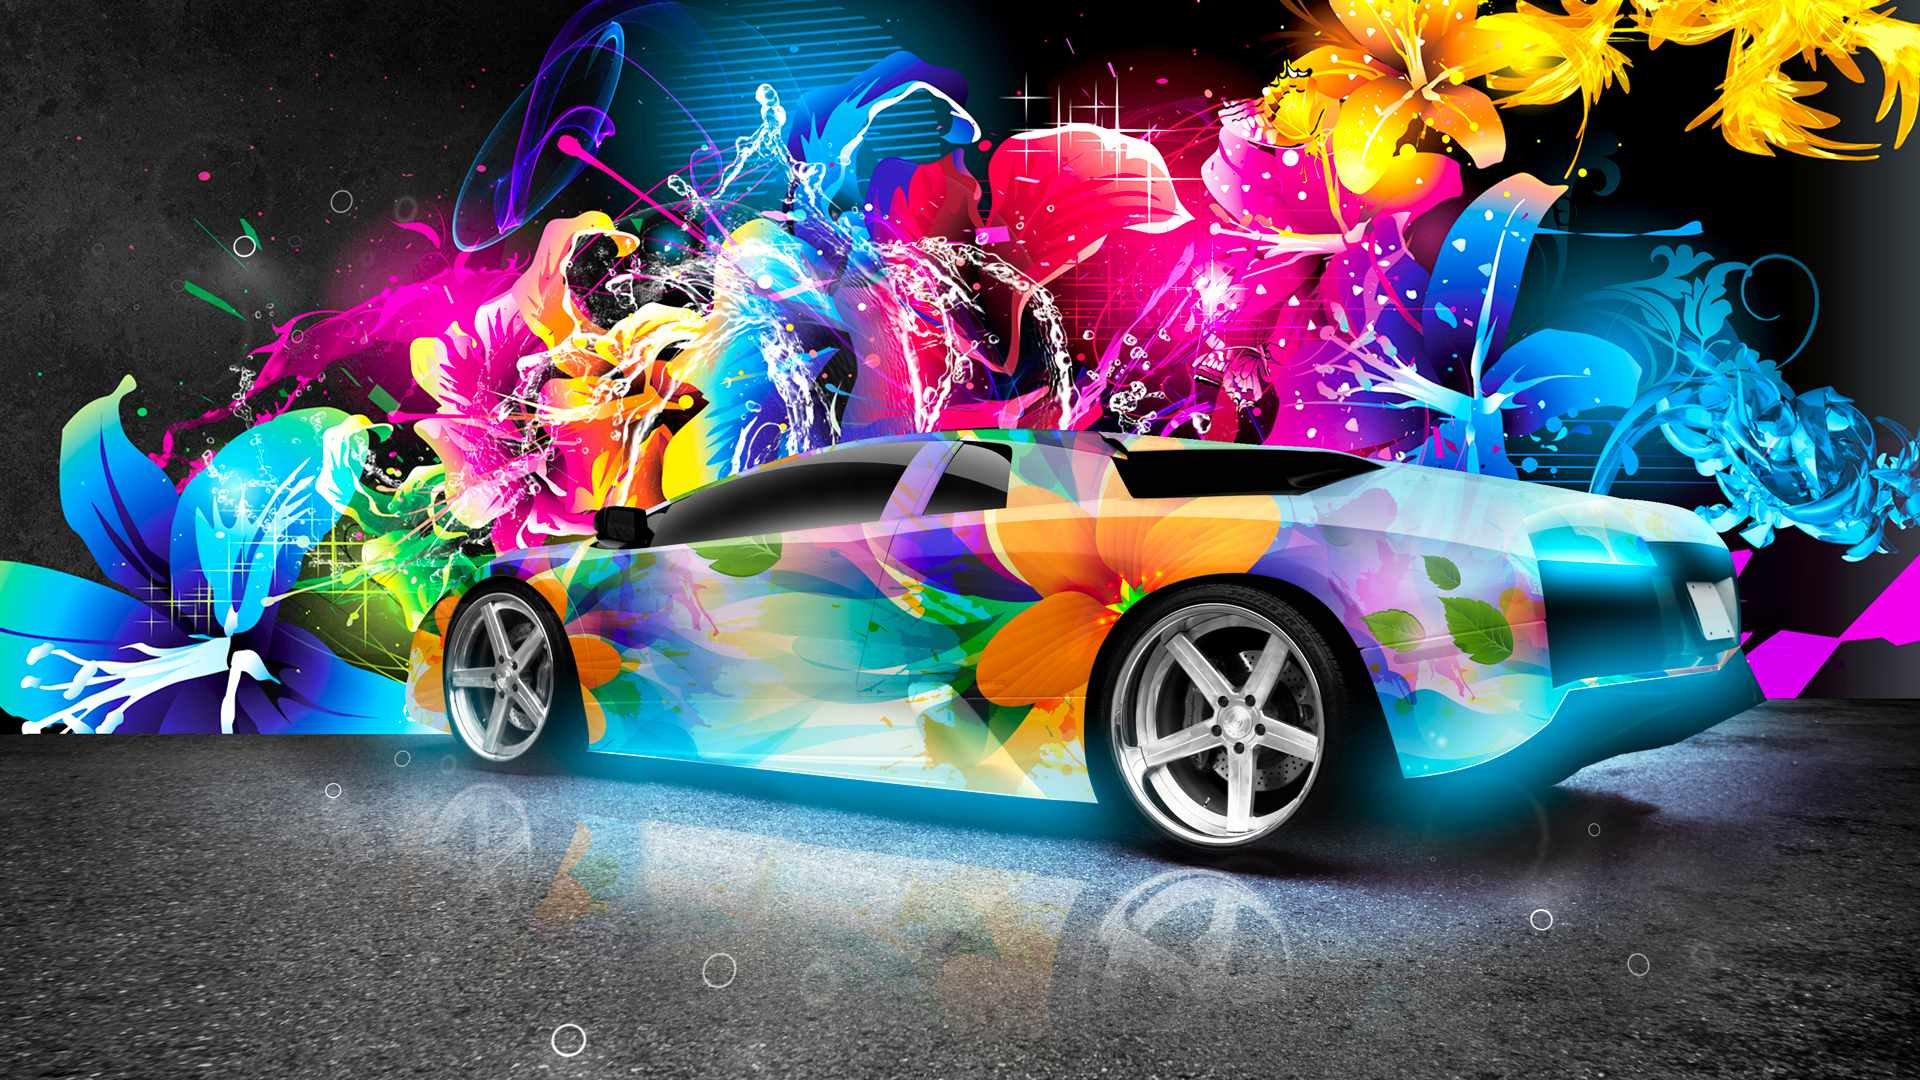 2015 Colorful Lamborghini Most Luxurious Car Backgrounds 1080p